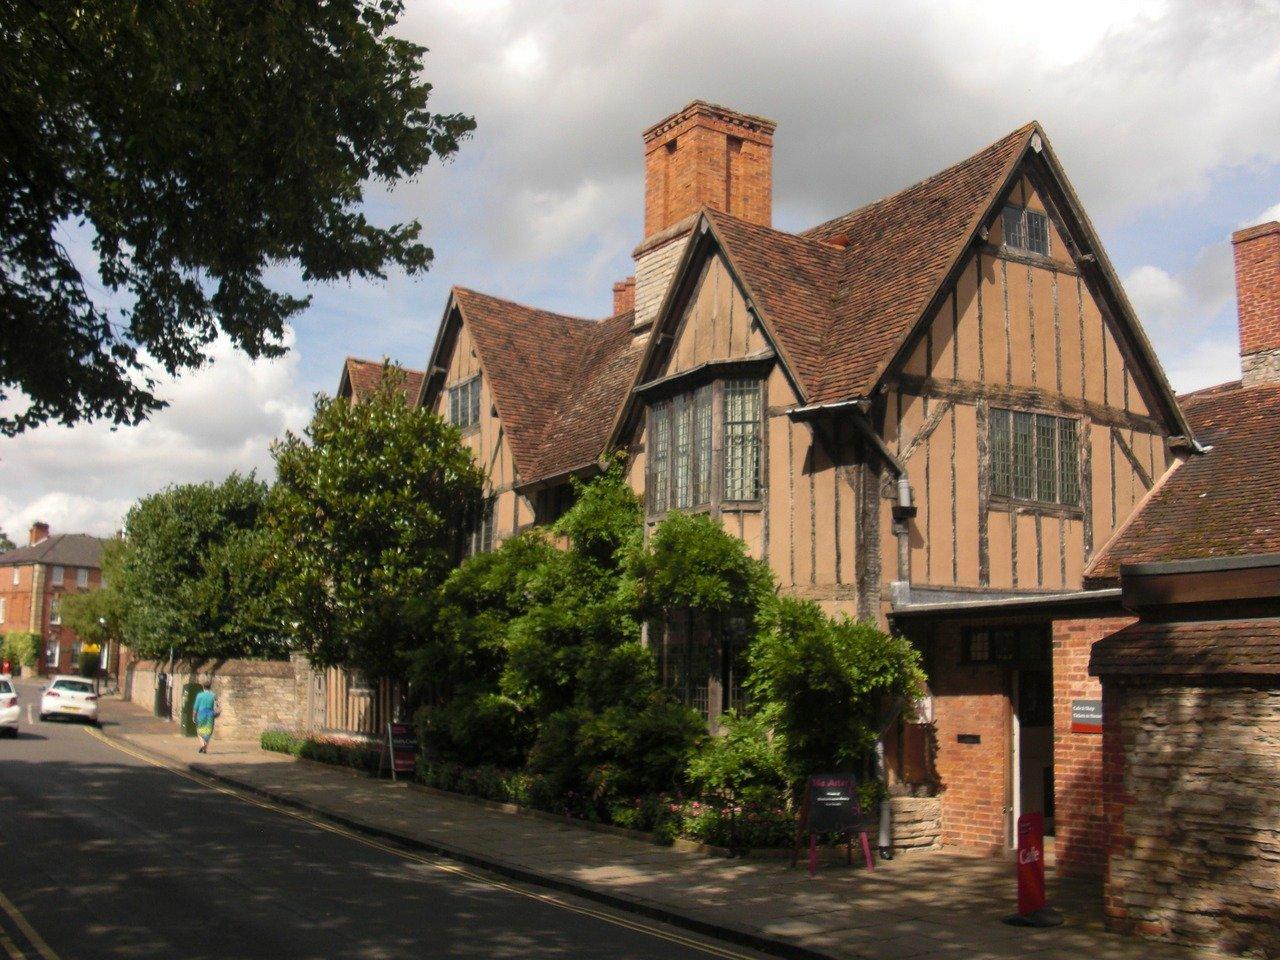 Stratford upon Avon Halls Croft